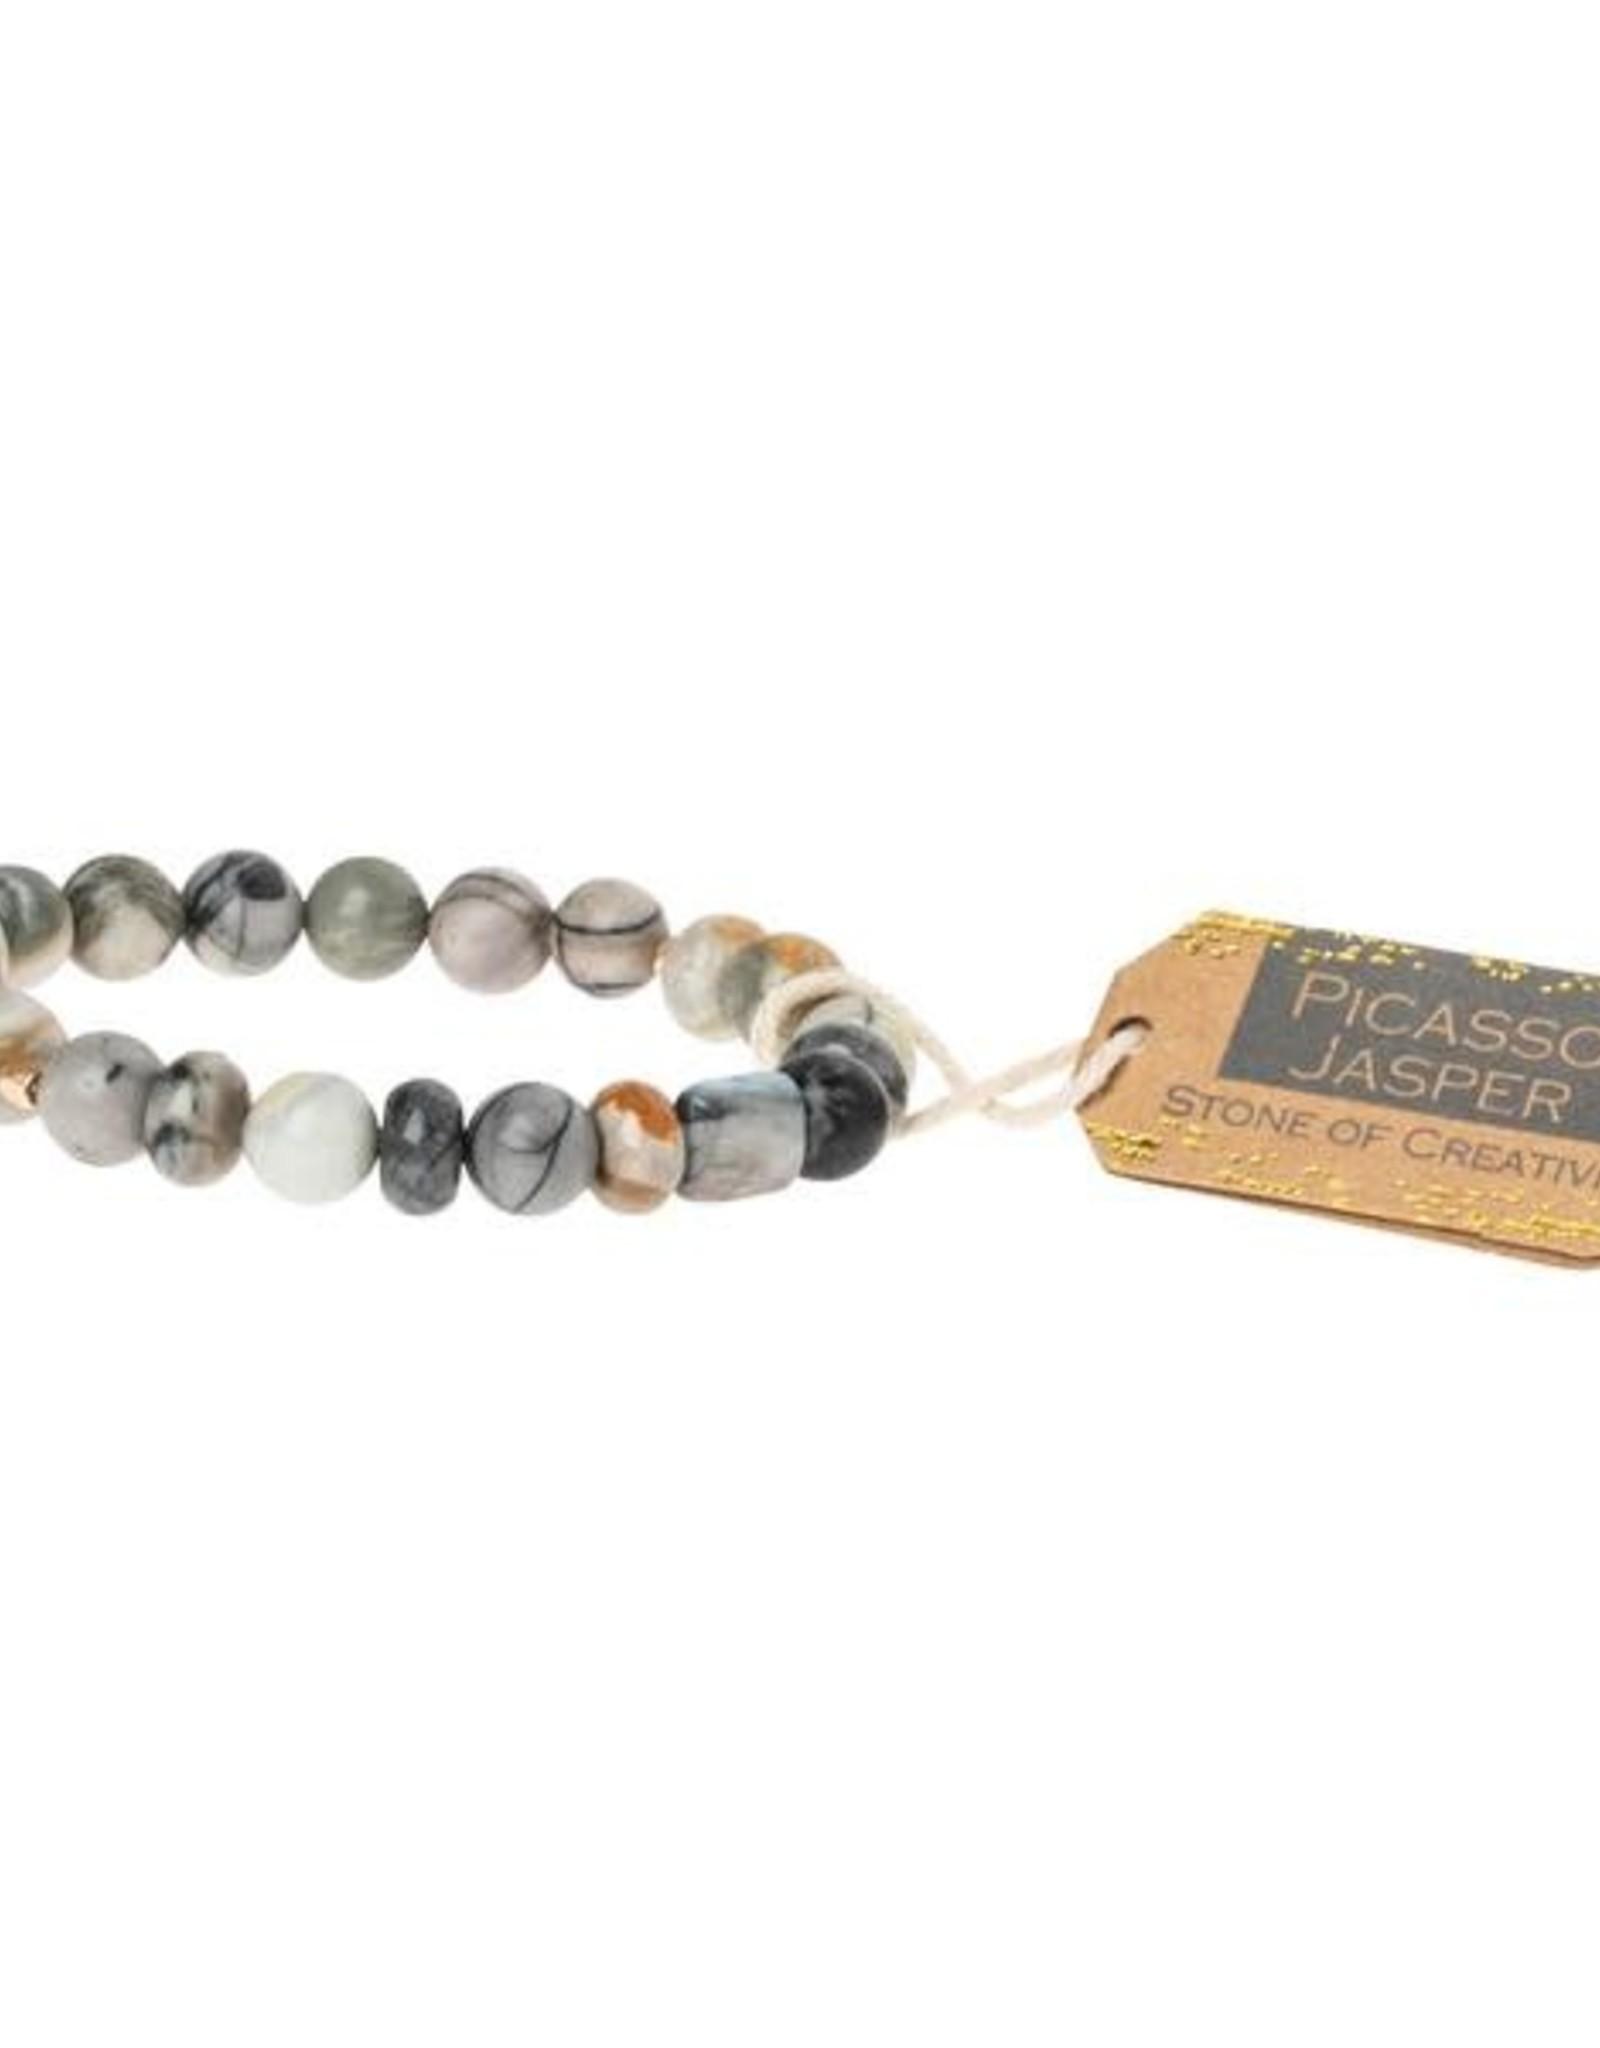 Scout Stone Bracelet - Picasso Jasper